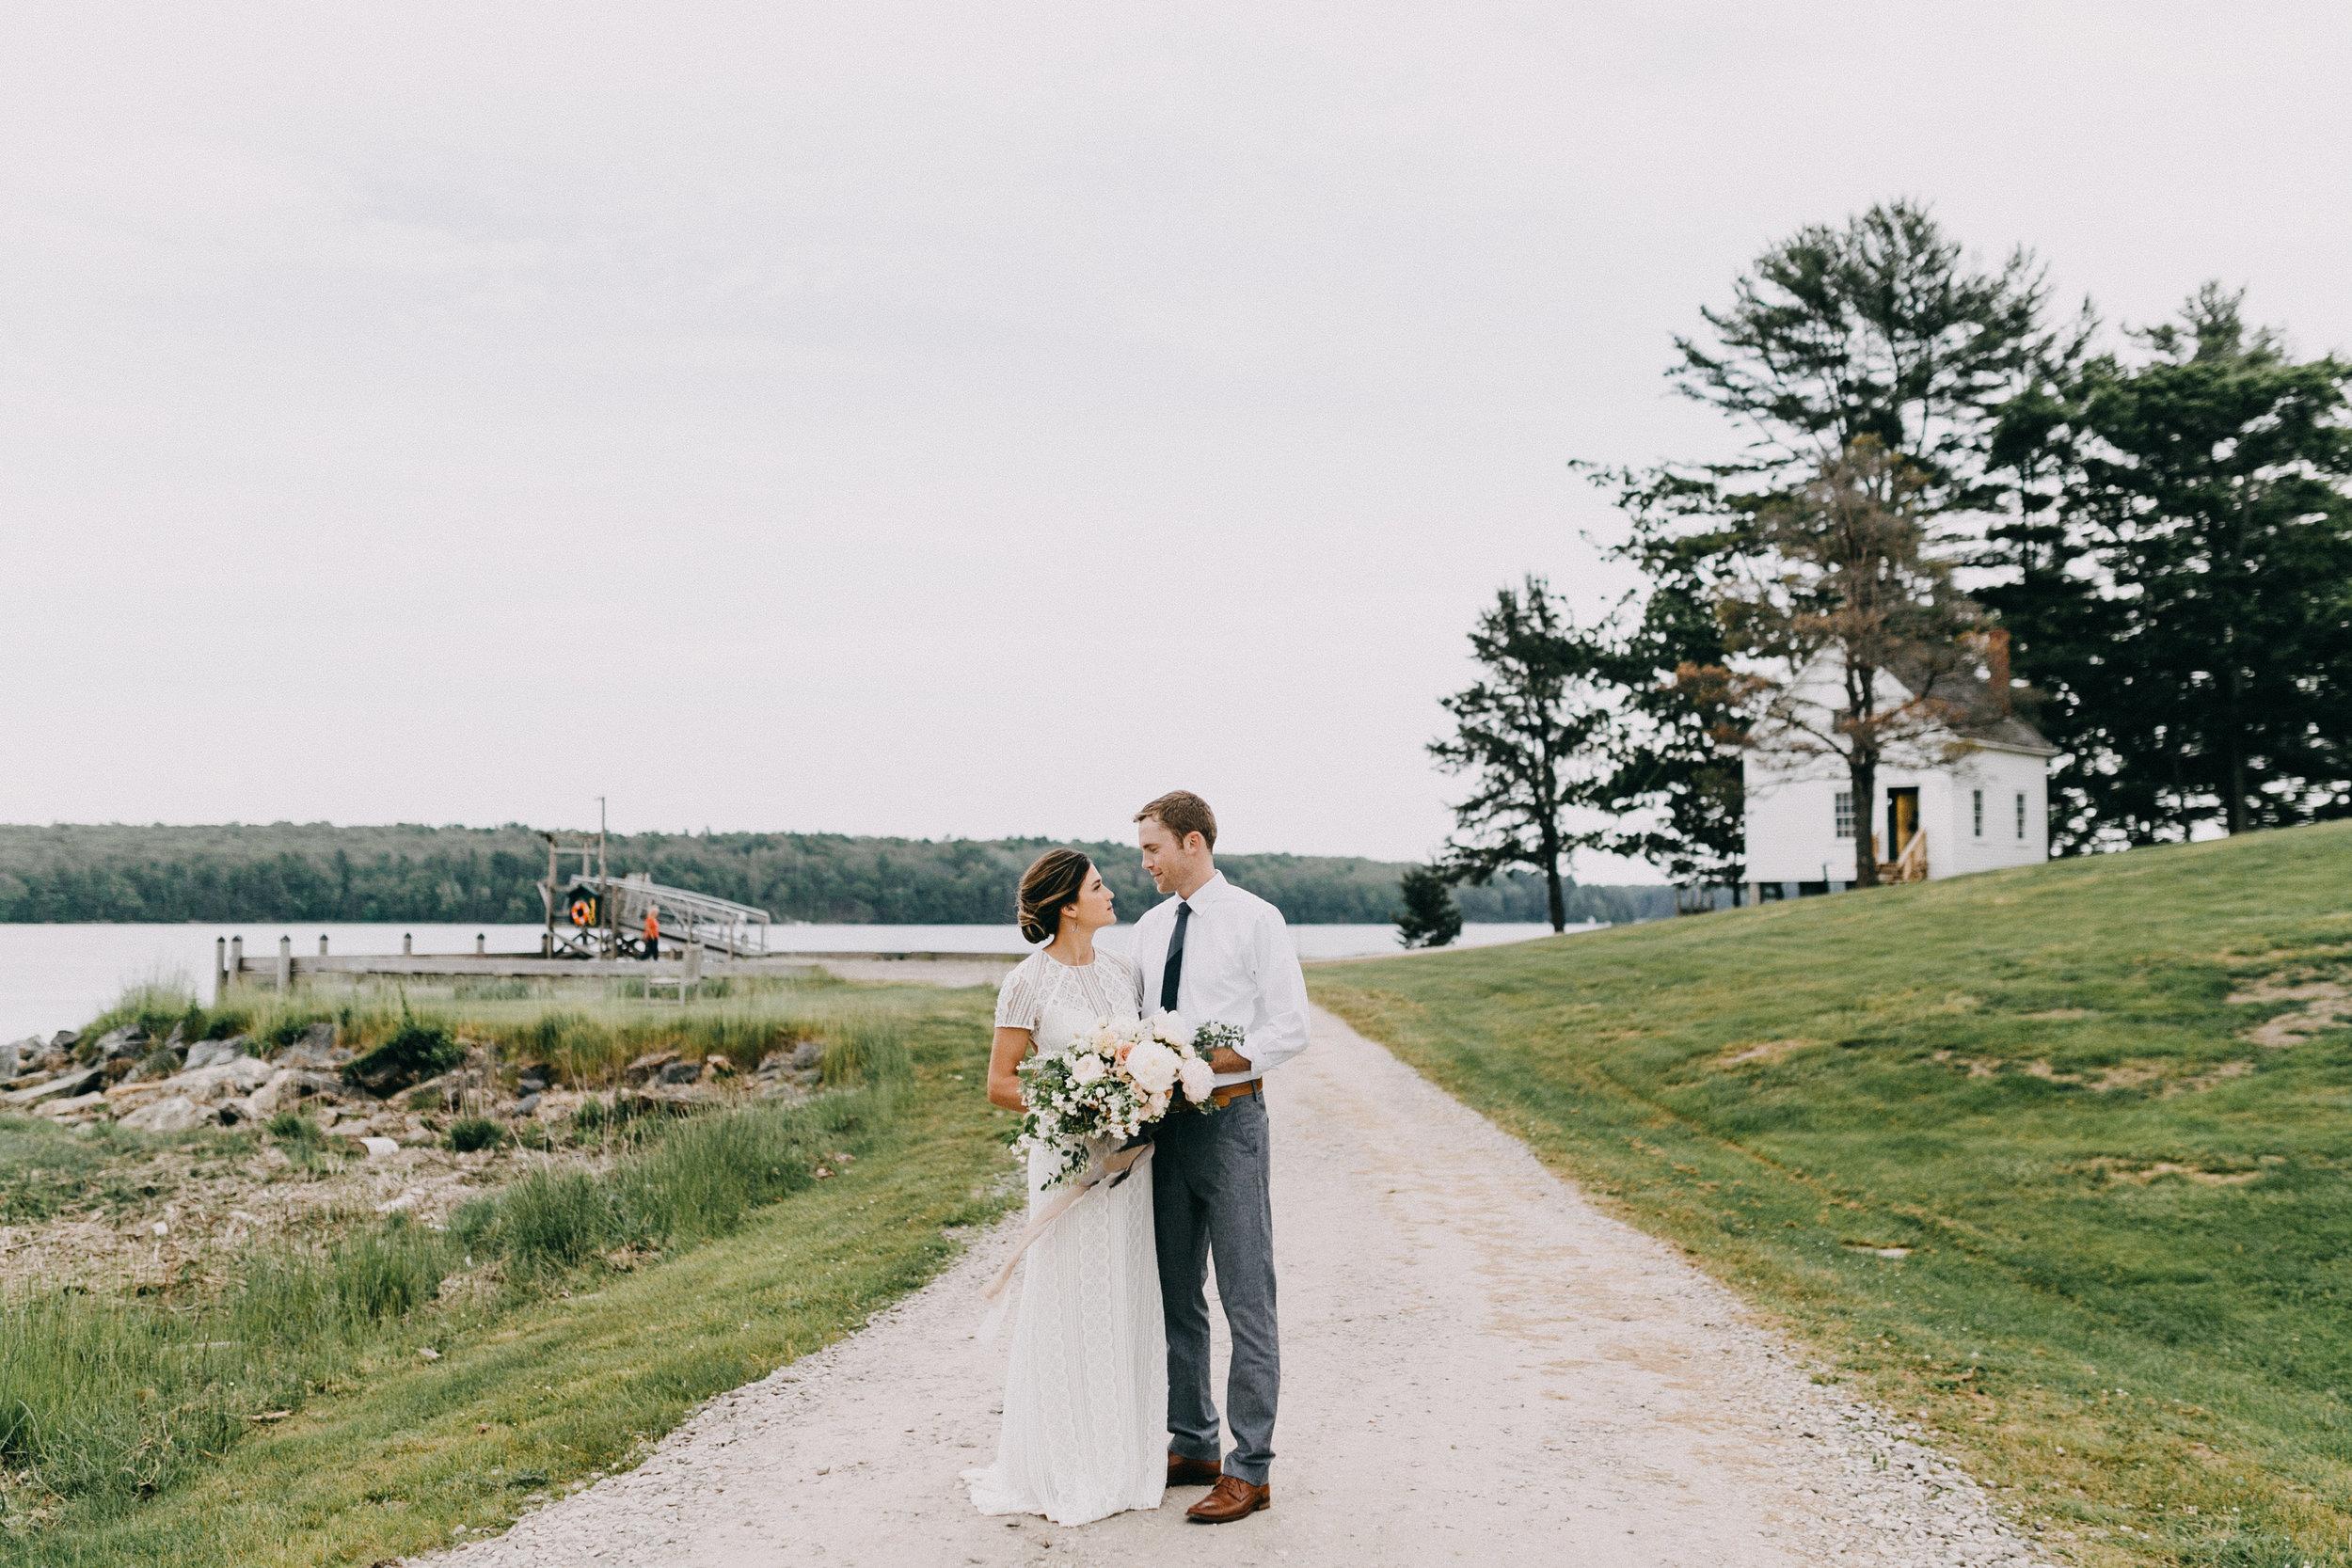 Watershed-Floral-Maine-Maritime-Wedding-Bridal-Bouquet-Centerpieces-0133.jpg